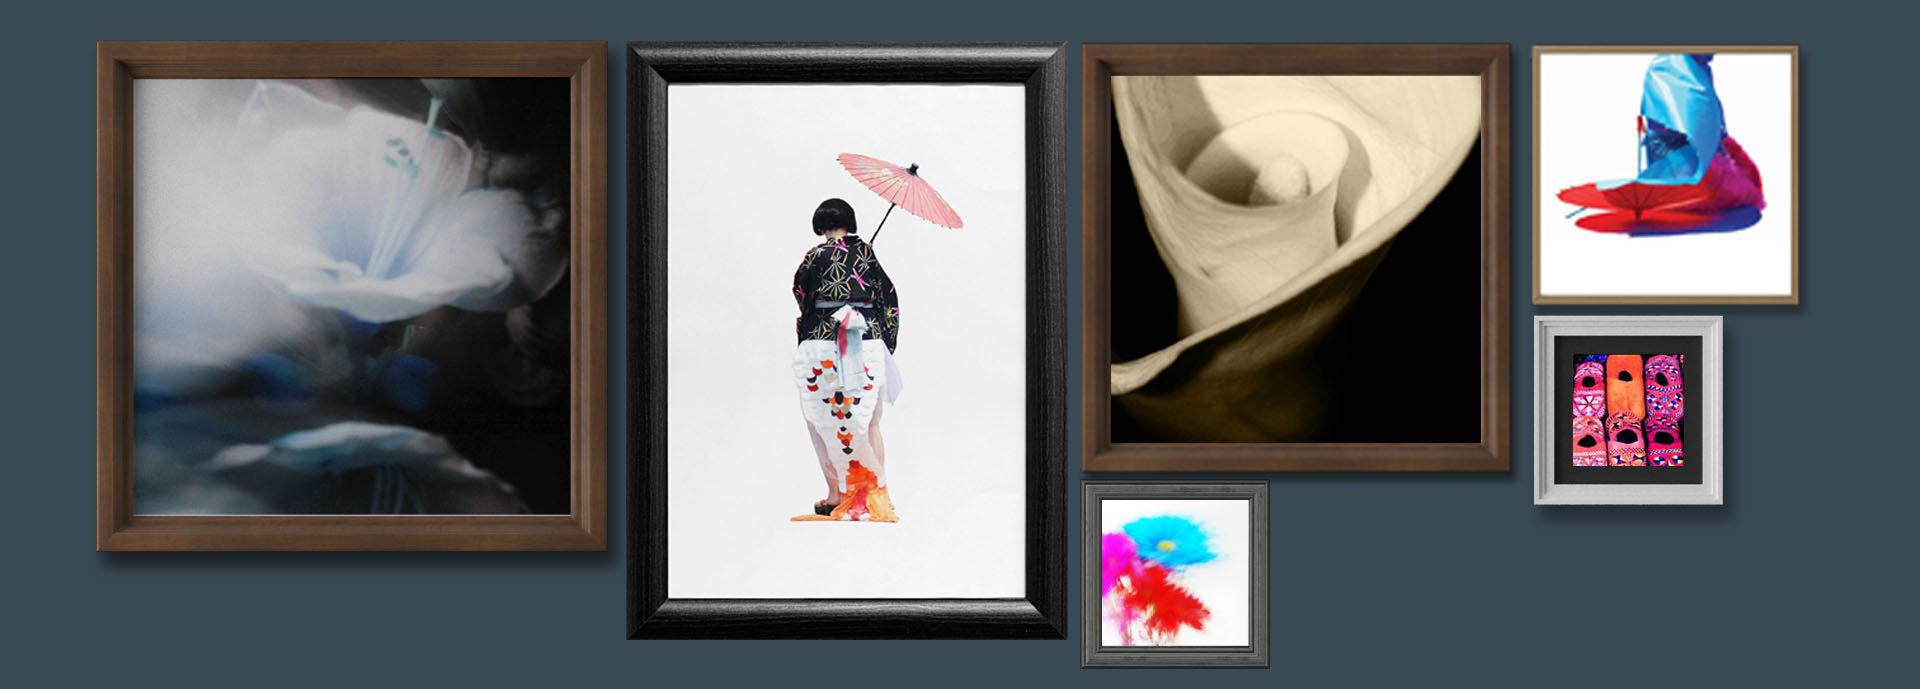 Lisa Cohen Imagemaker